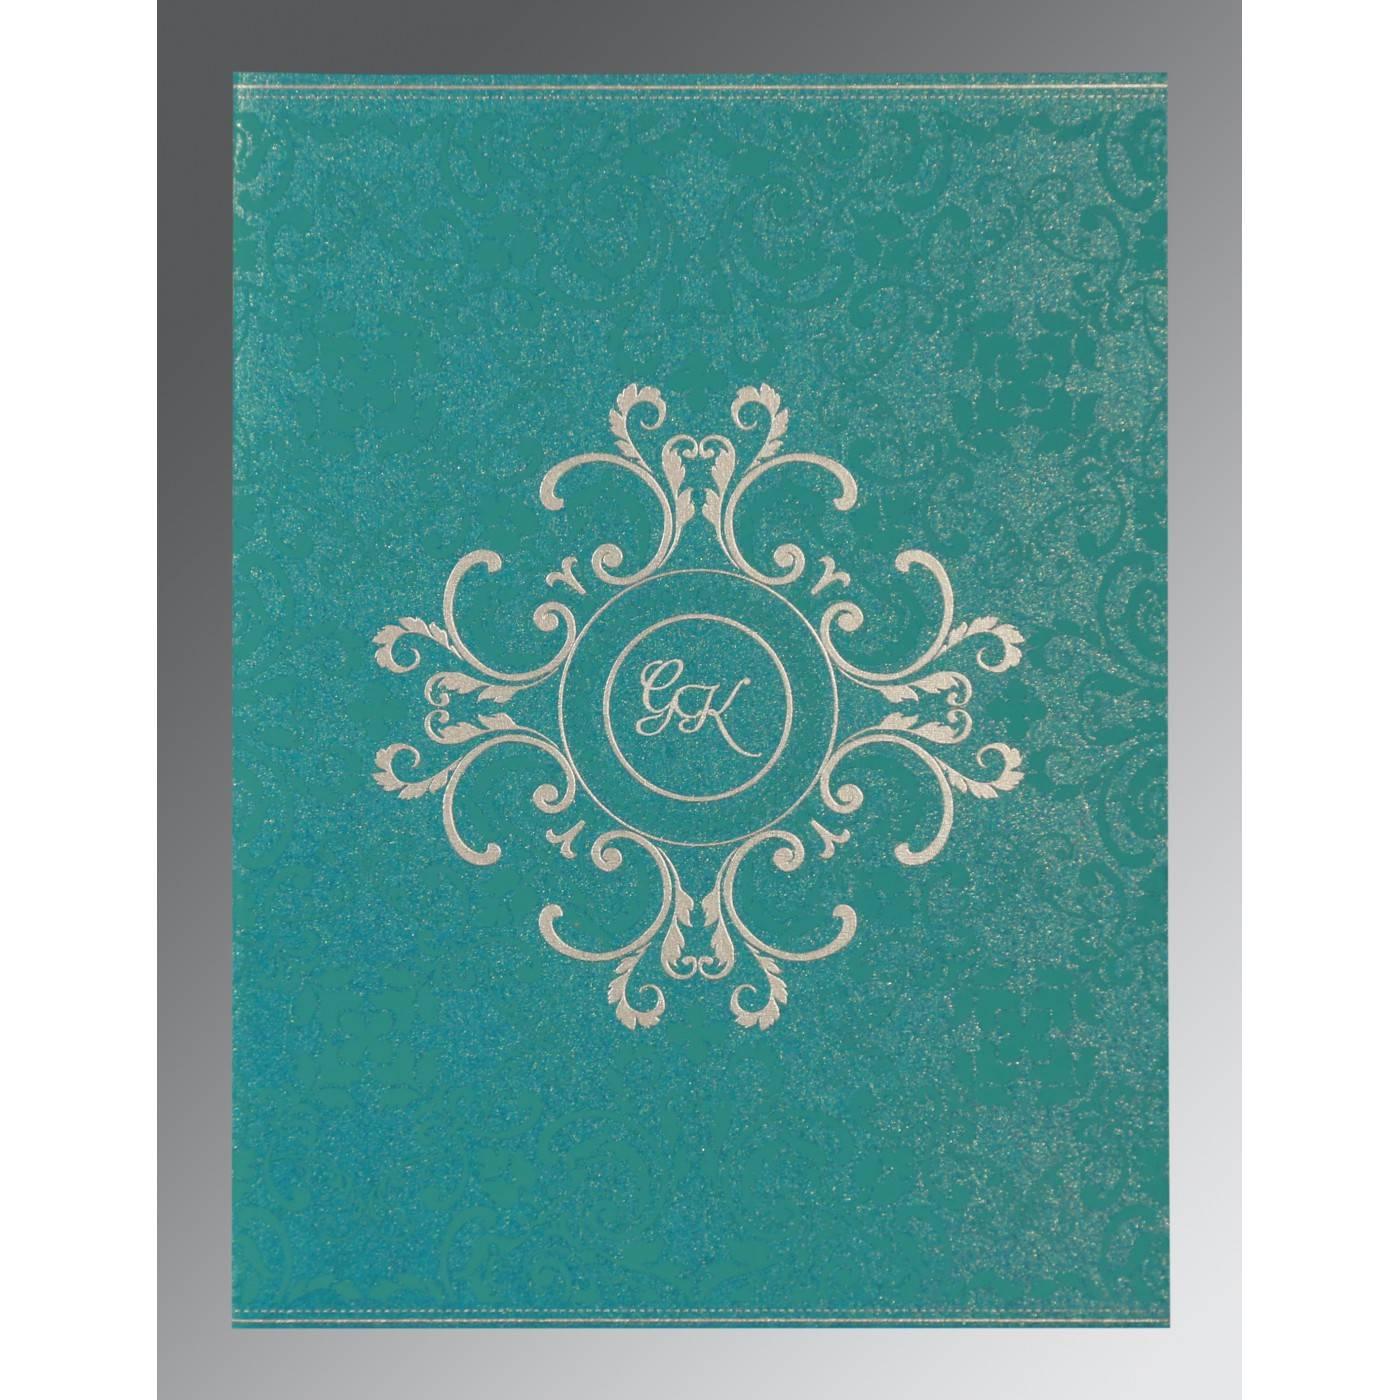 TEAL BLUE SHIMMERY SCREEN PRINTED WEDDING CARD : CSO-8244C - IndianWeddingCards